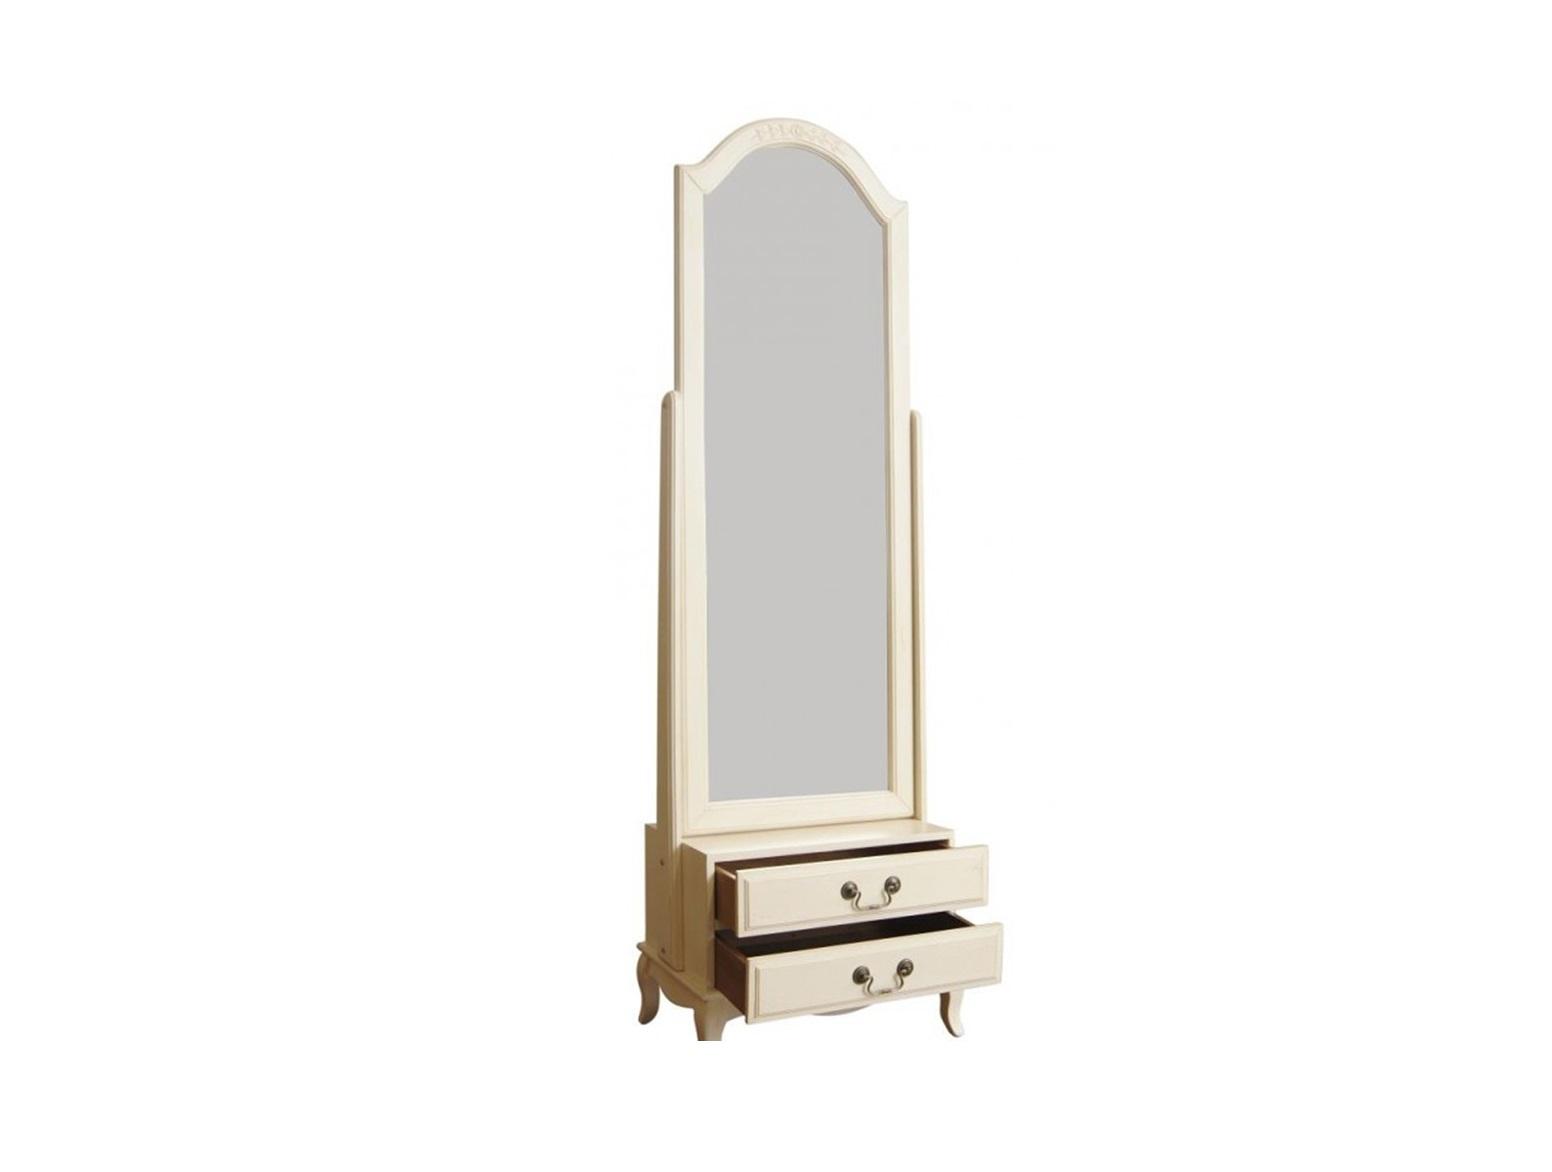 Зеркало напольноеНапольные зеркала<br><br><br>Material: Бук<br>Width см: 54<br>Depth см: 36<br>Height см: 174